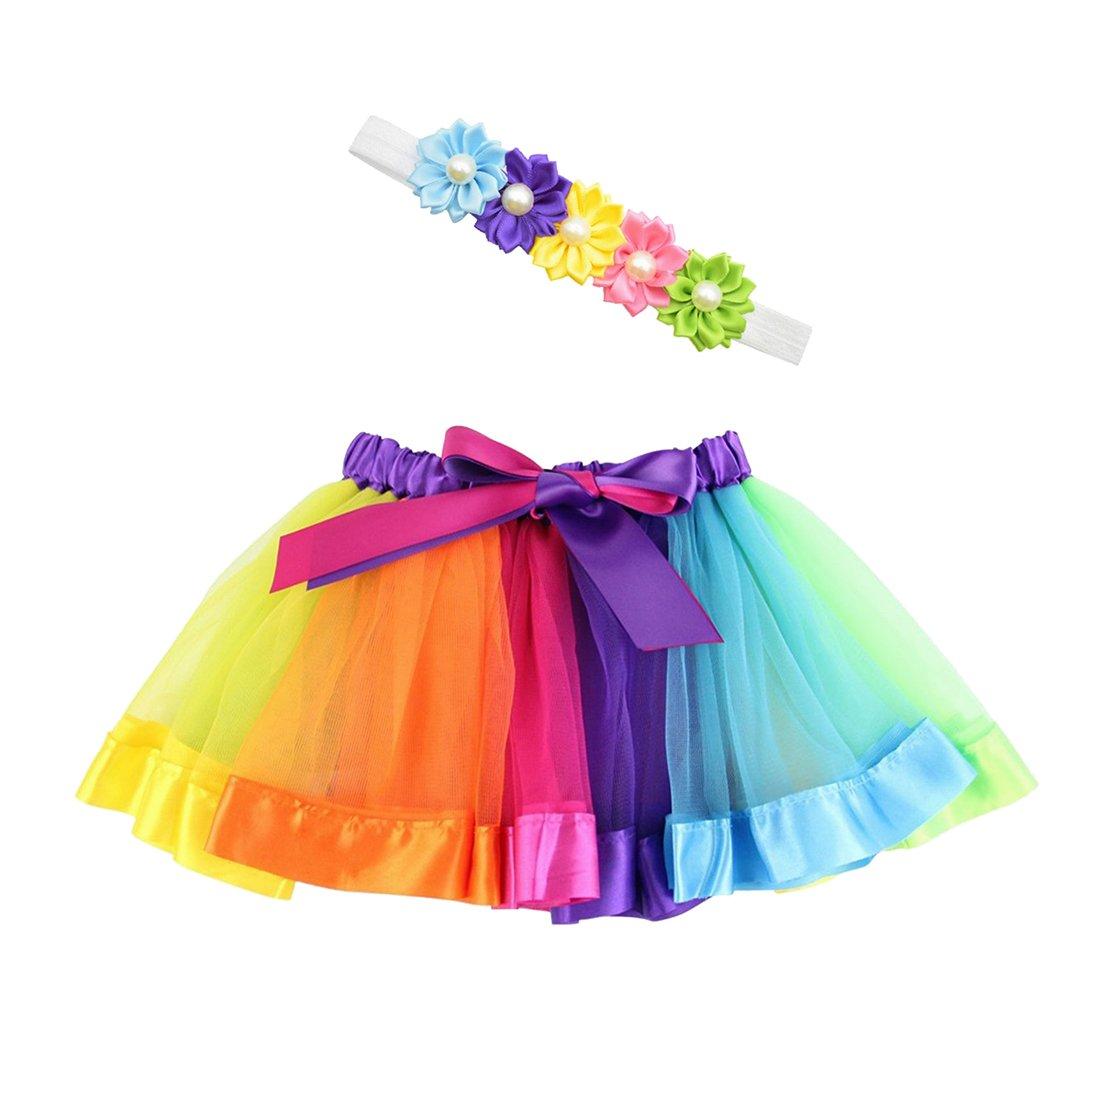 Maying Girls Layered Rainbow Tutu Skirt Dance Ballet Party Ruffle Dress Multicolor A)